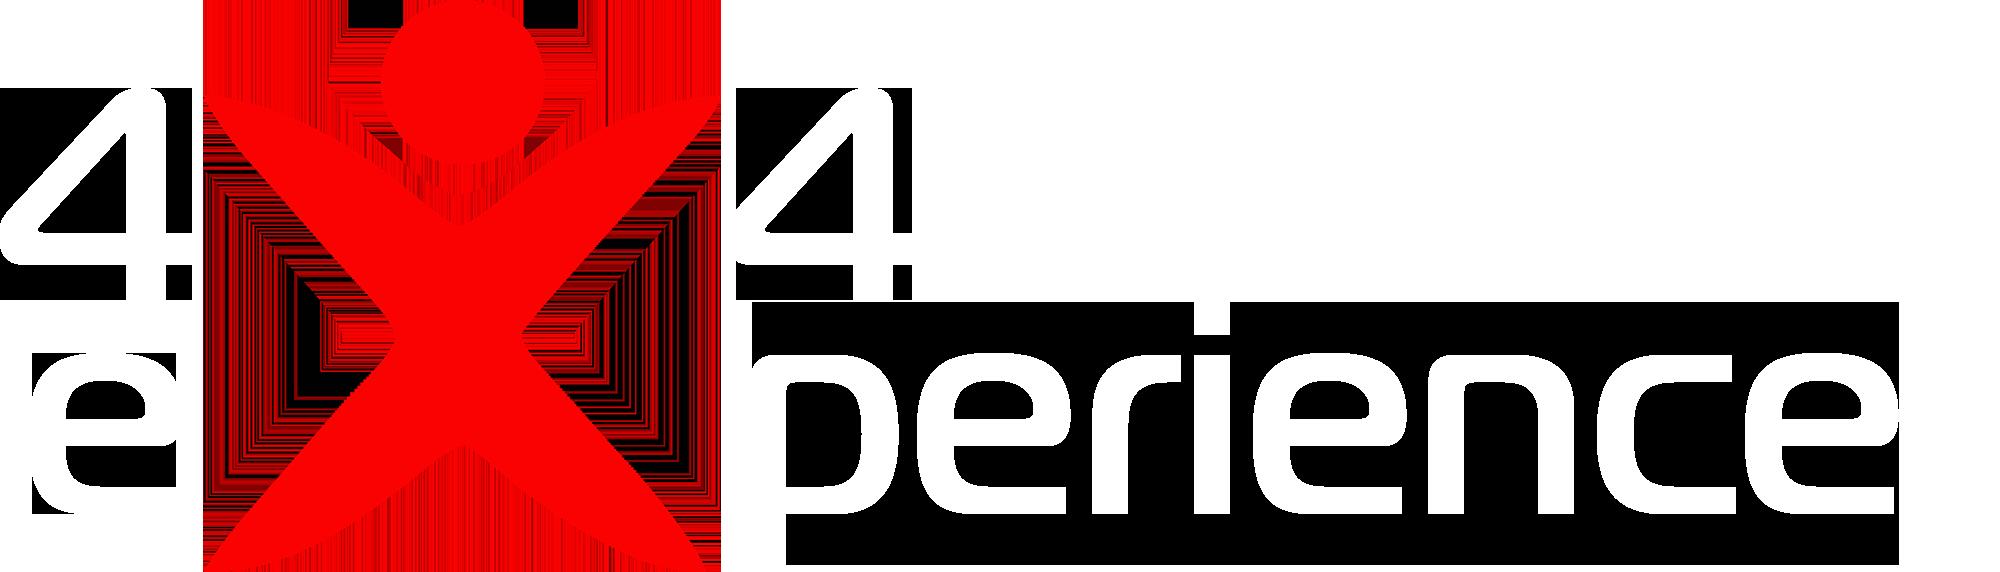 Experience 4x4